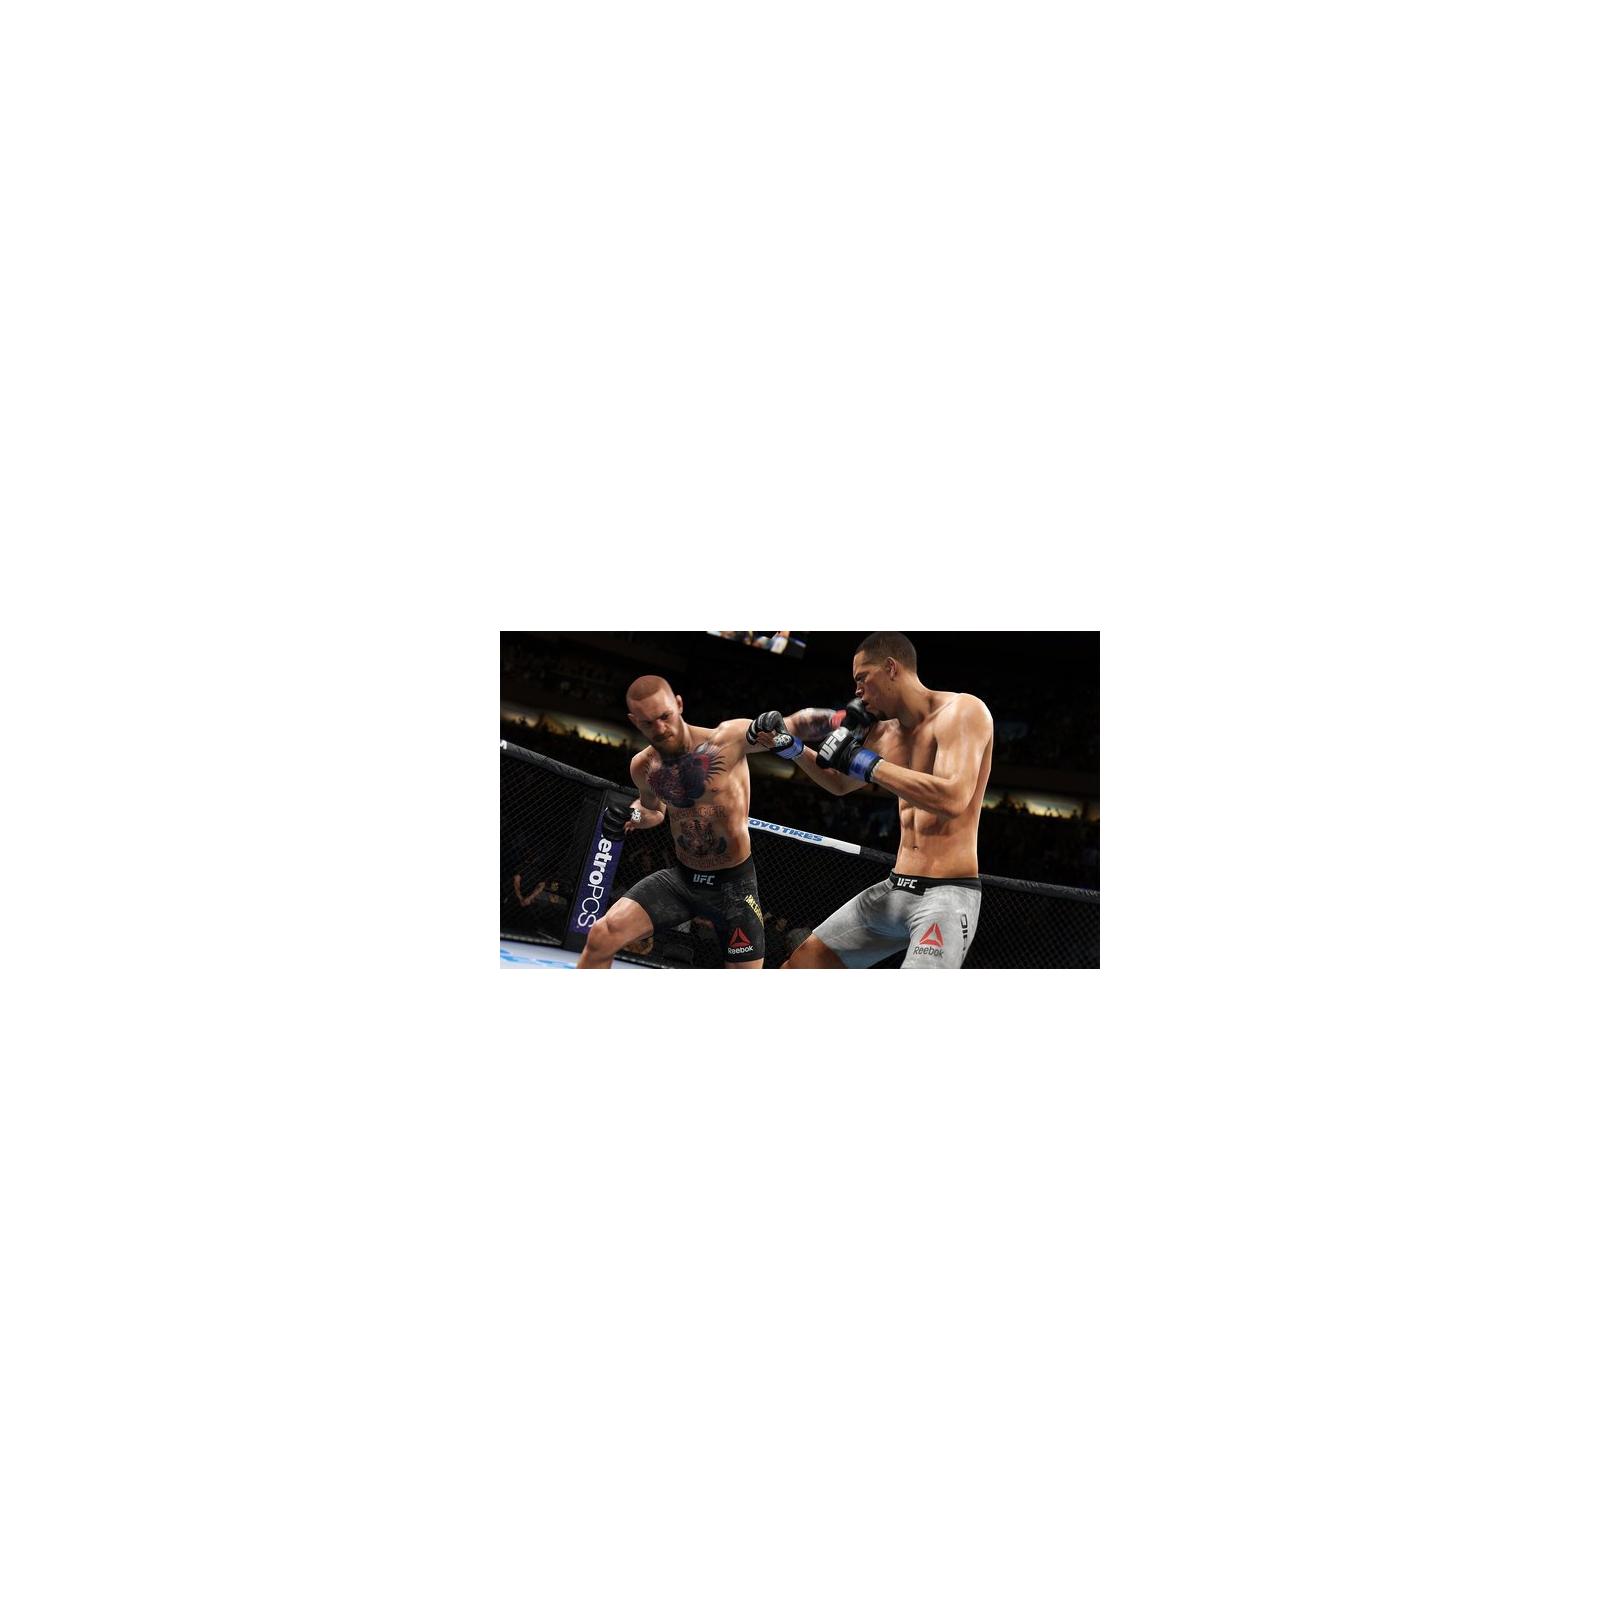 Игра Sony EA SPORTS UFC 3 [PS4, Russian subtitles] (1034661) изображение 4